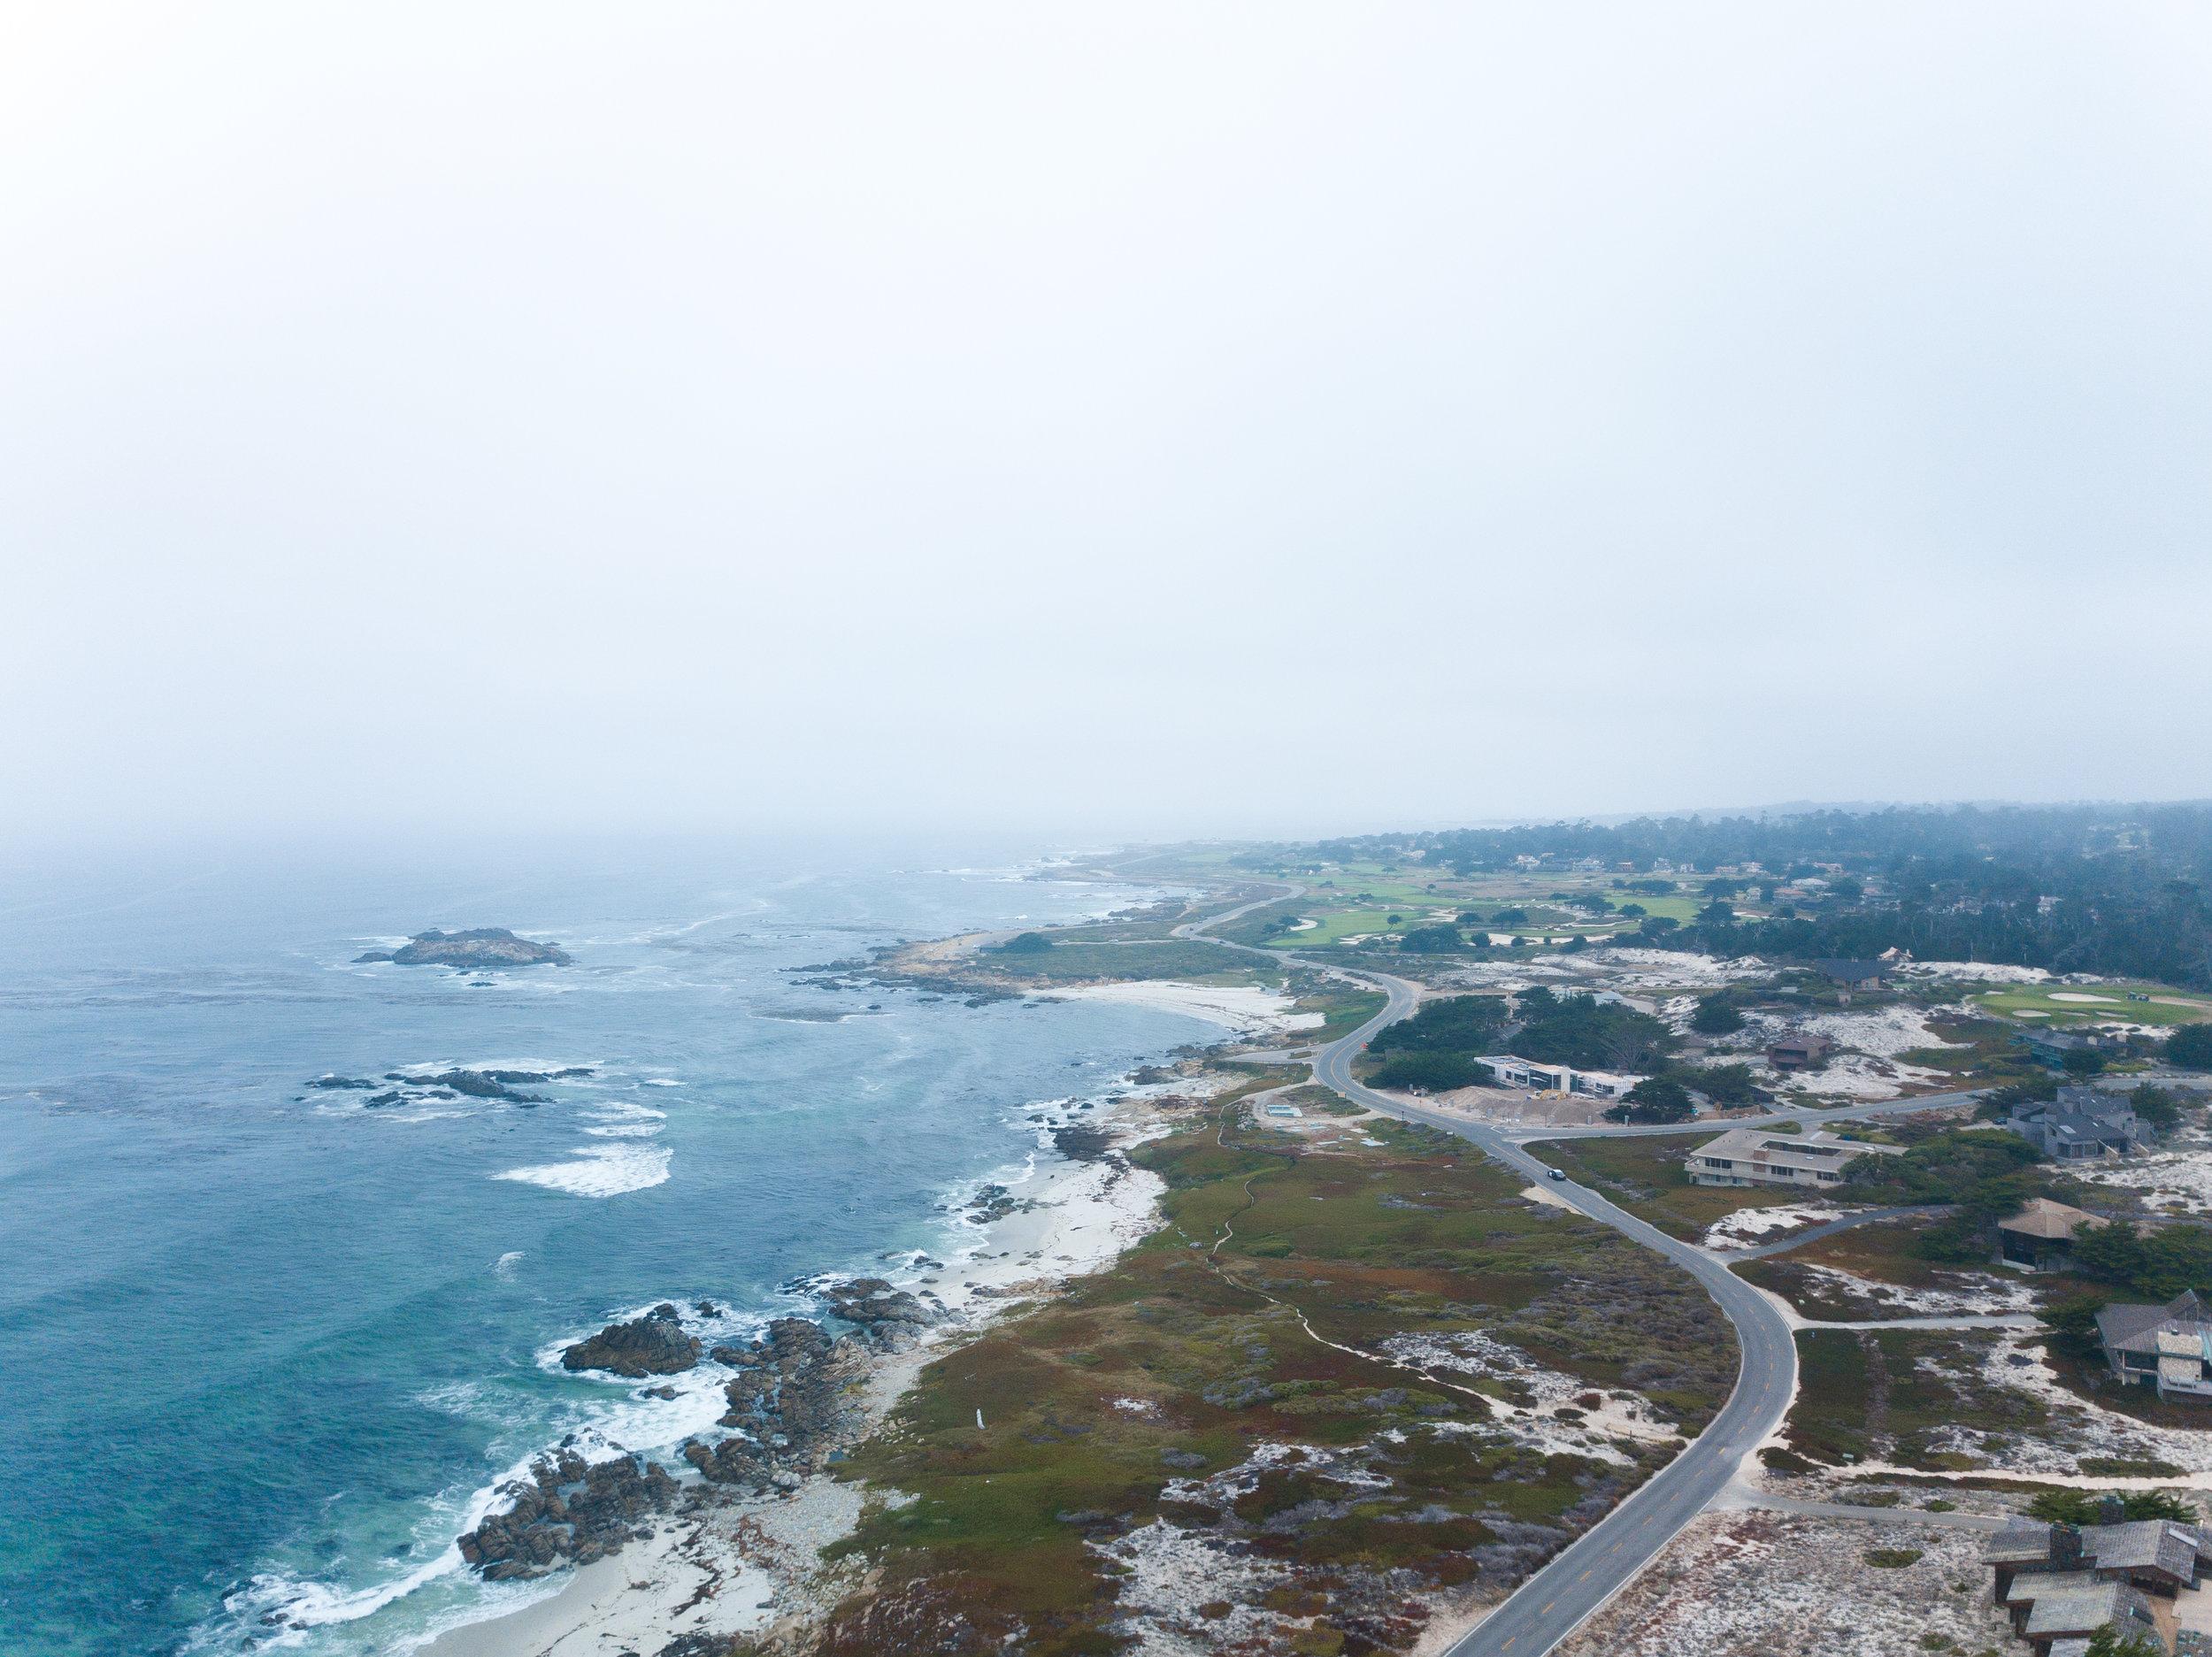 Stay_Driven_Monterey_Mclarens_DRONE-28.jpg